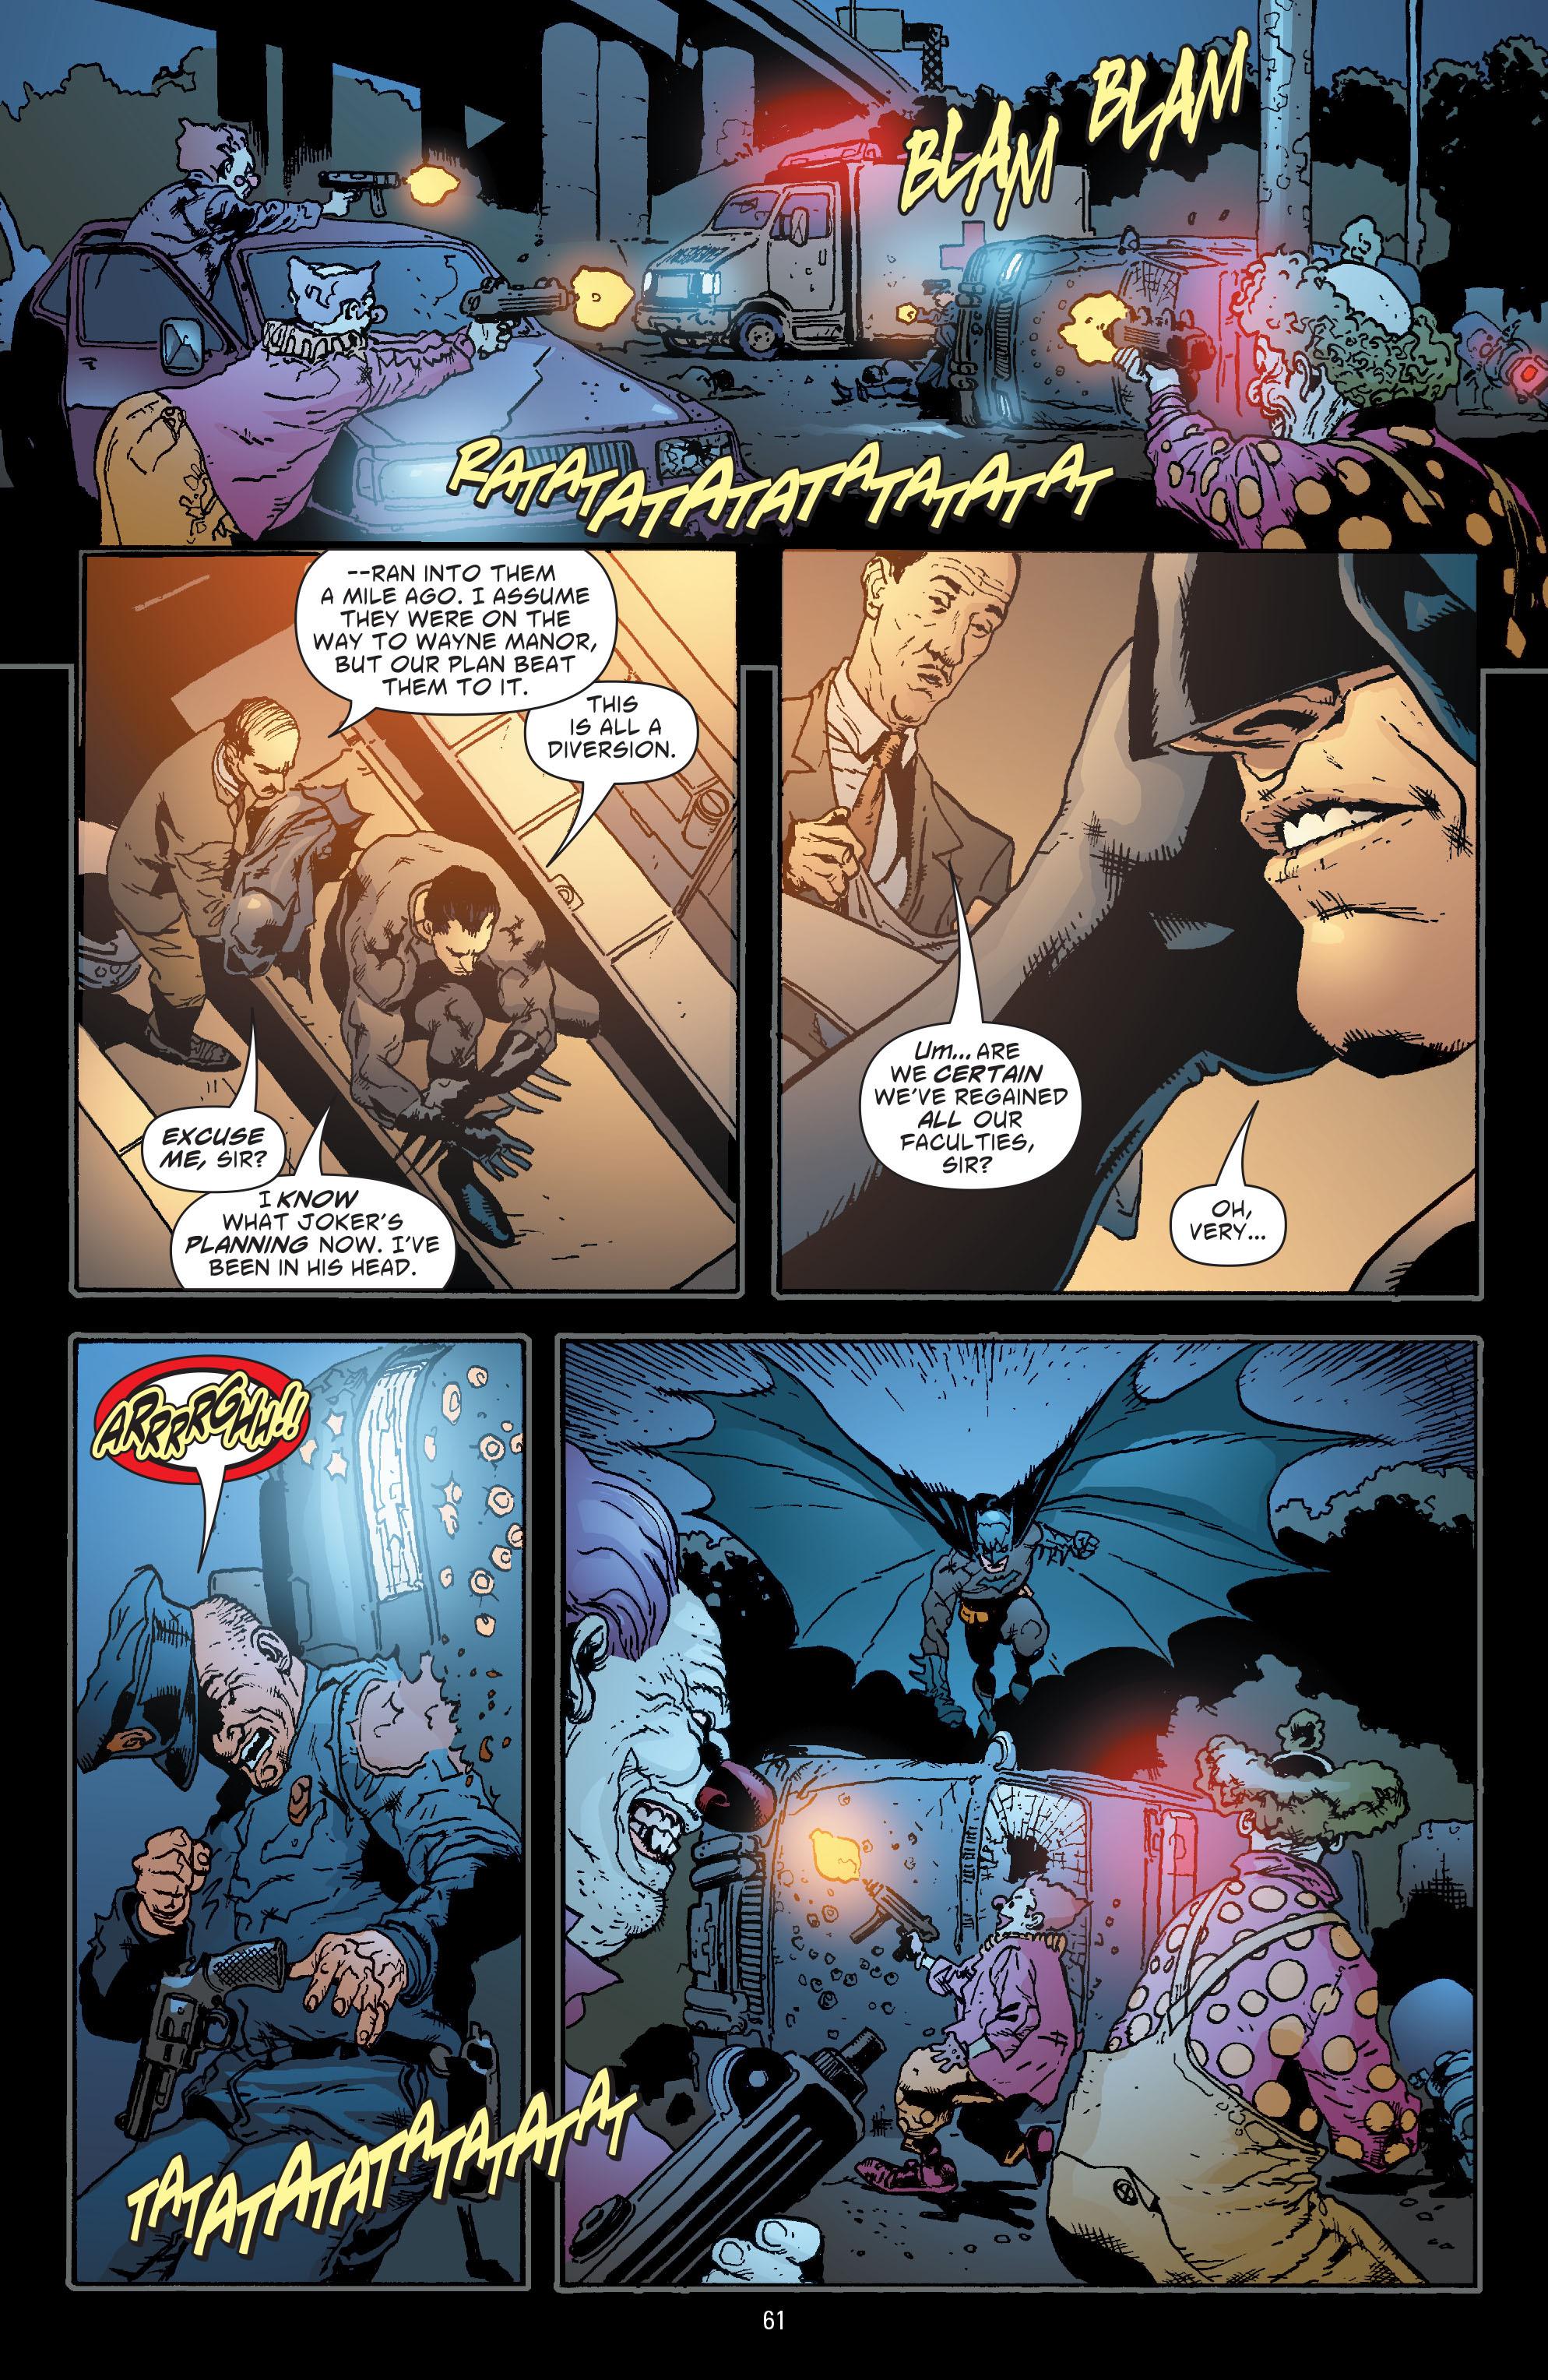 Batman: The Man Who Laughs chap 1 pic 62